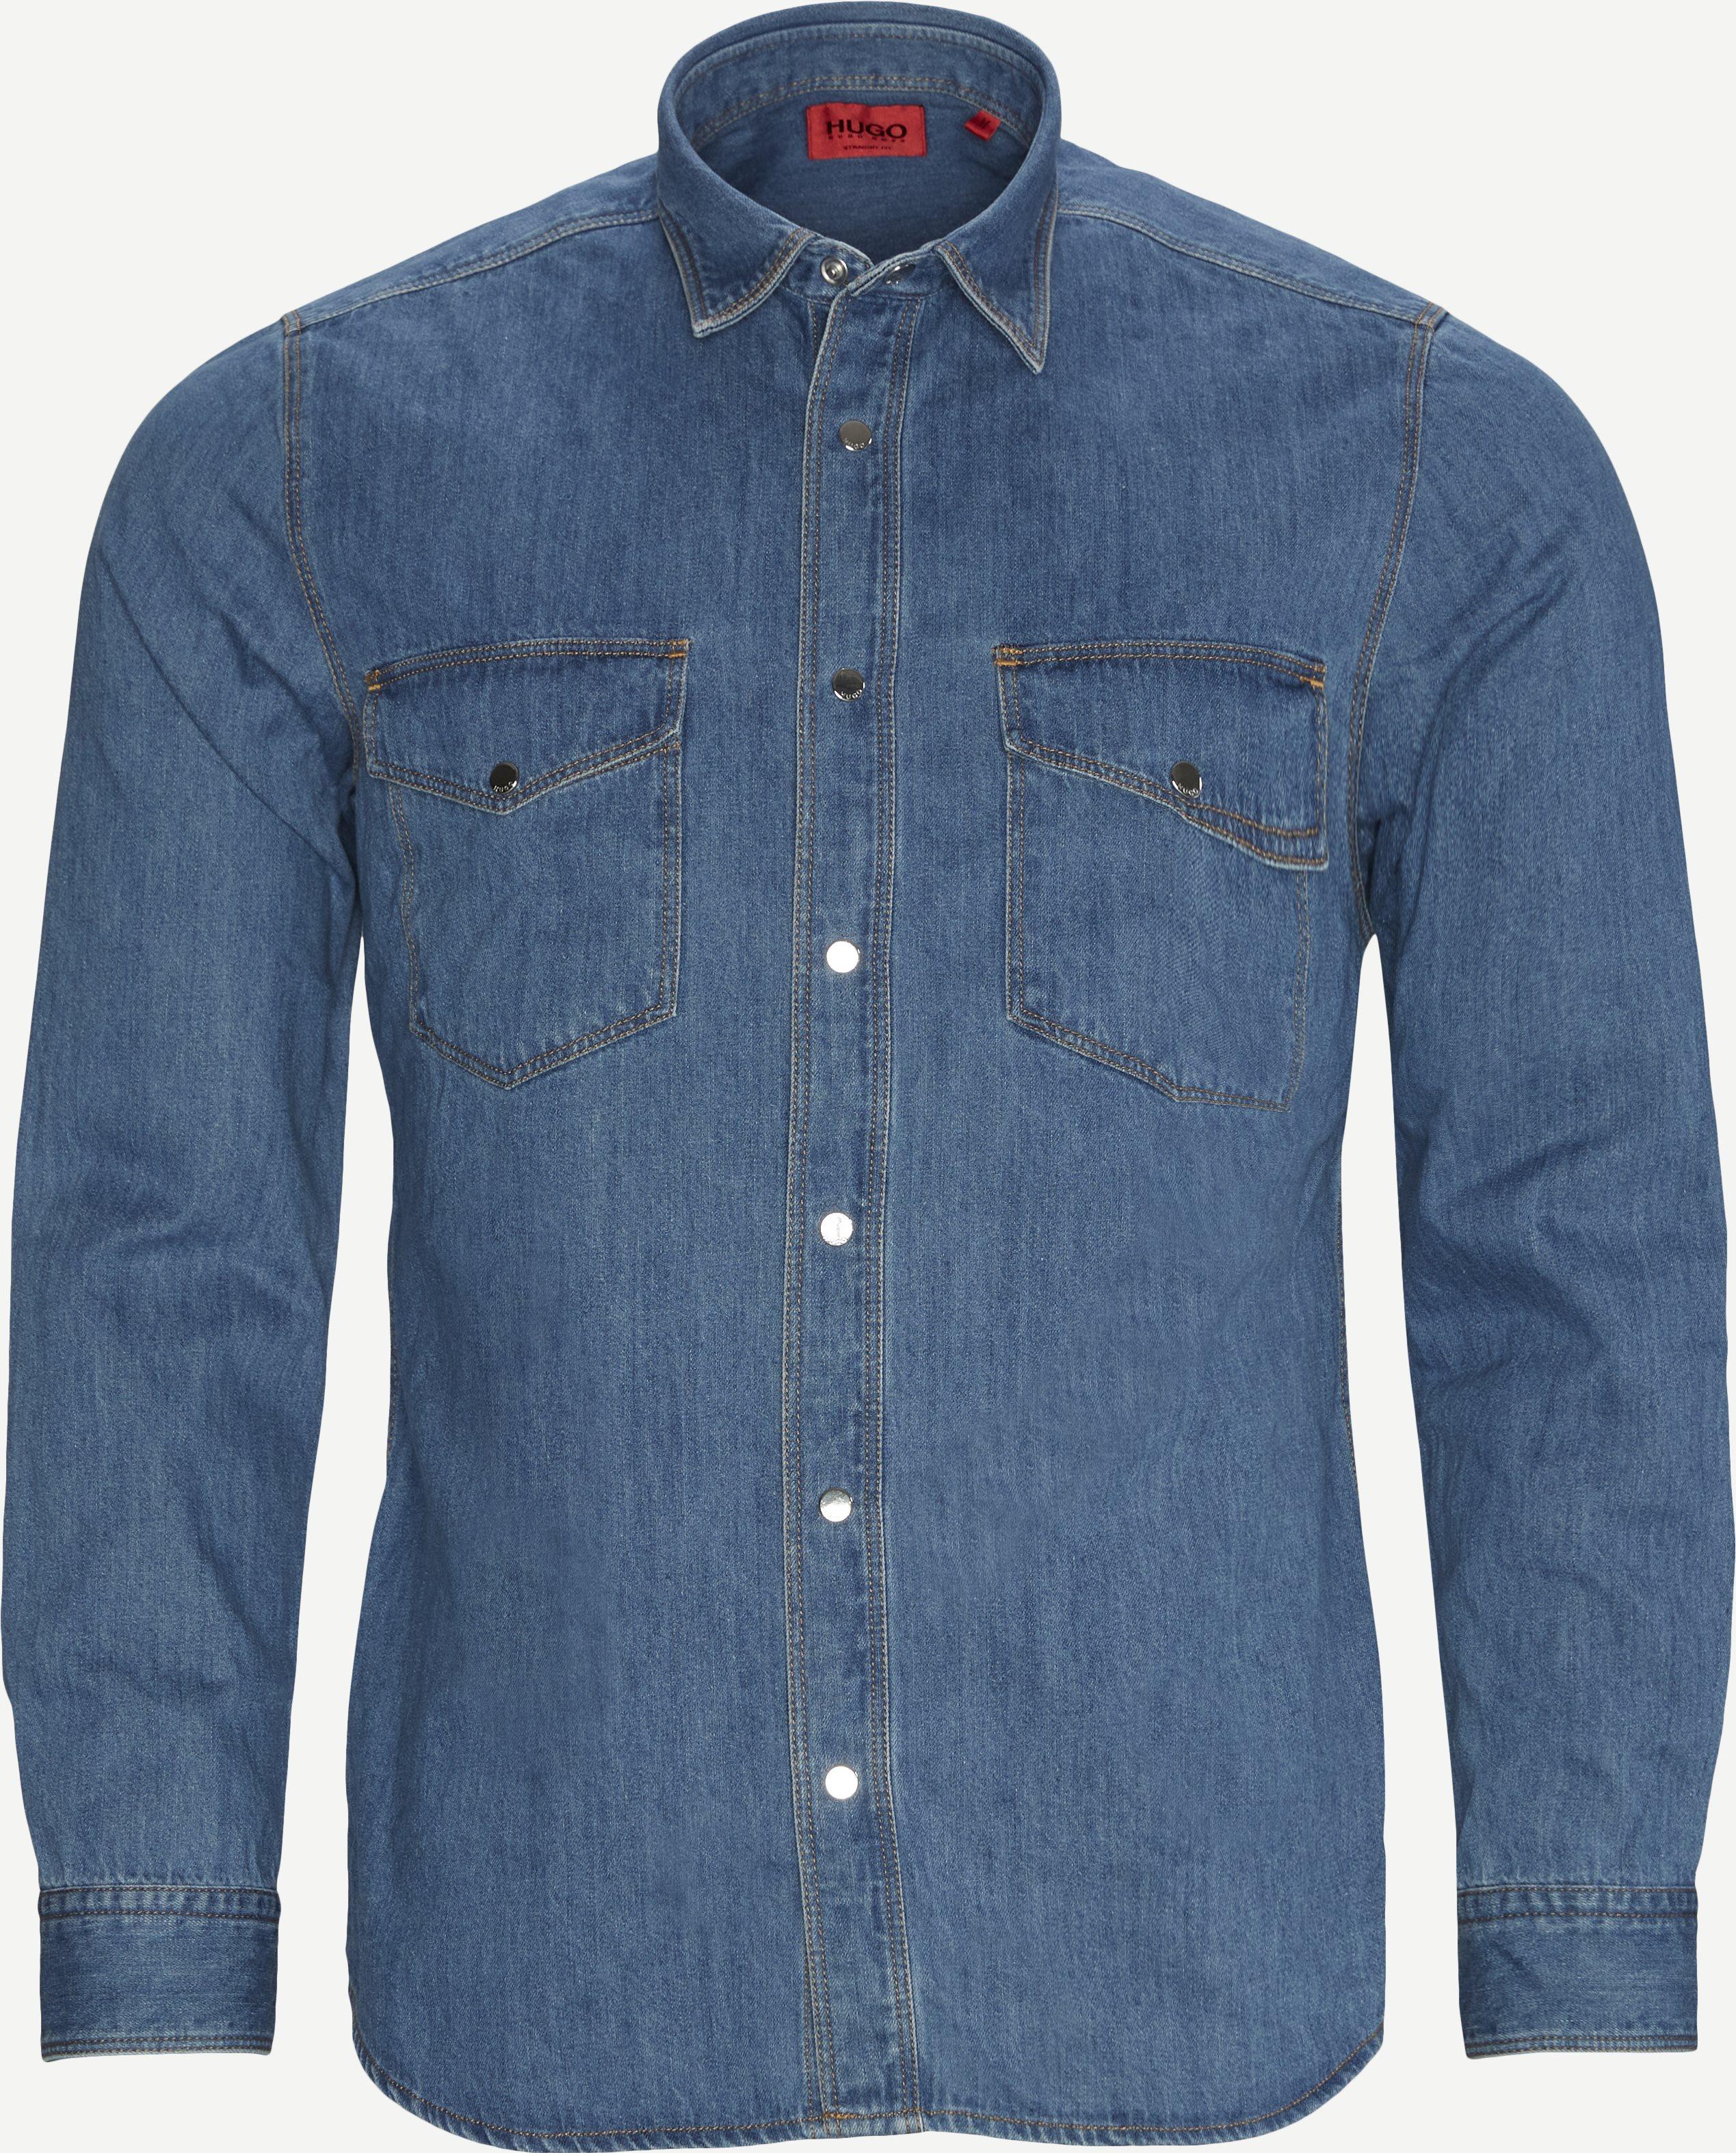 Skjortor - Straight fit - Denim